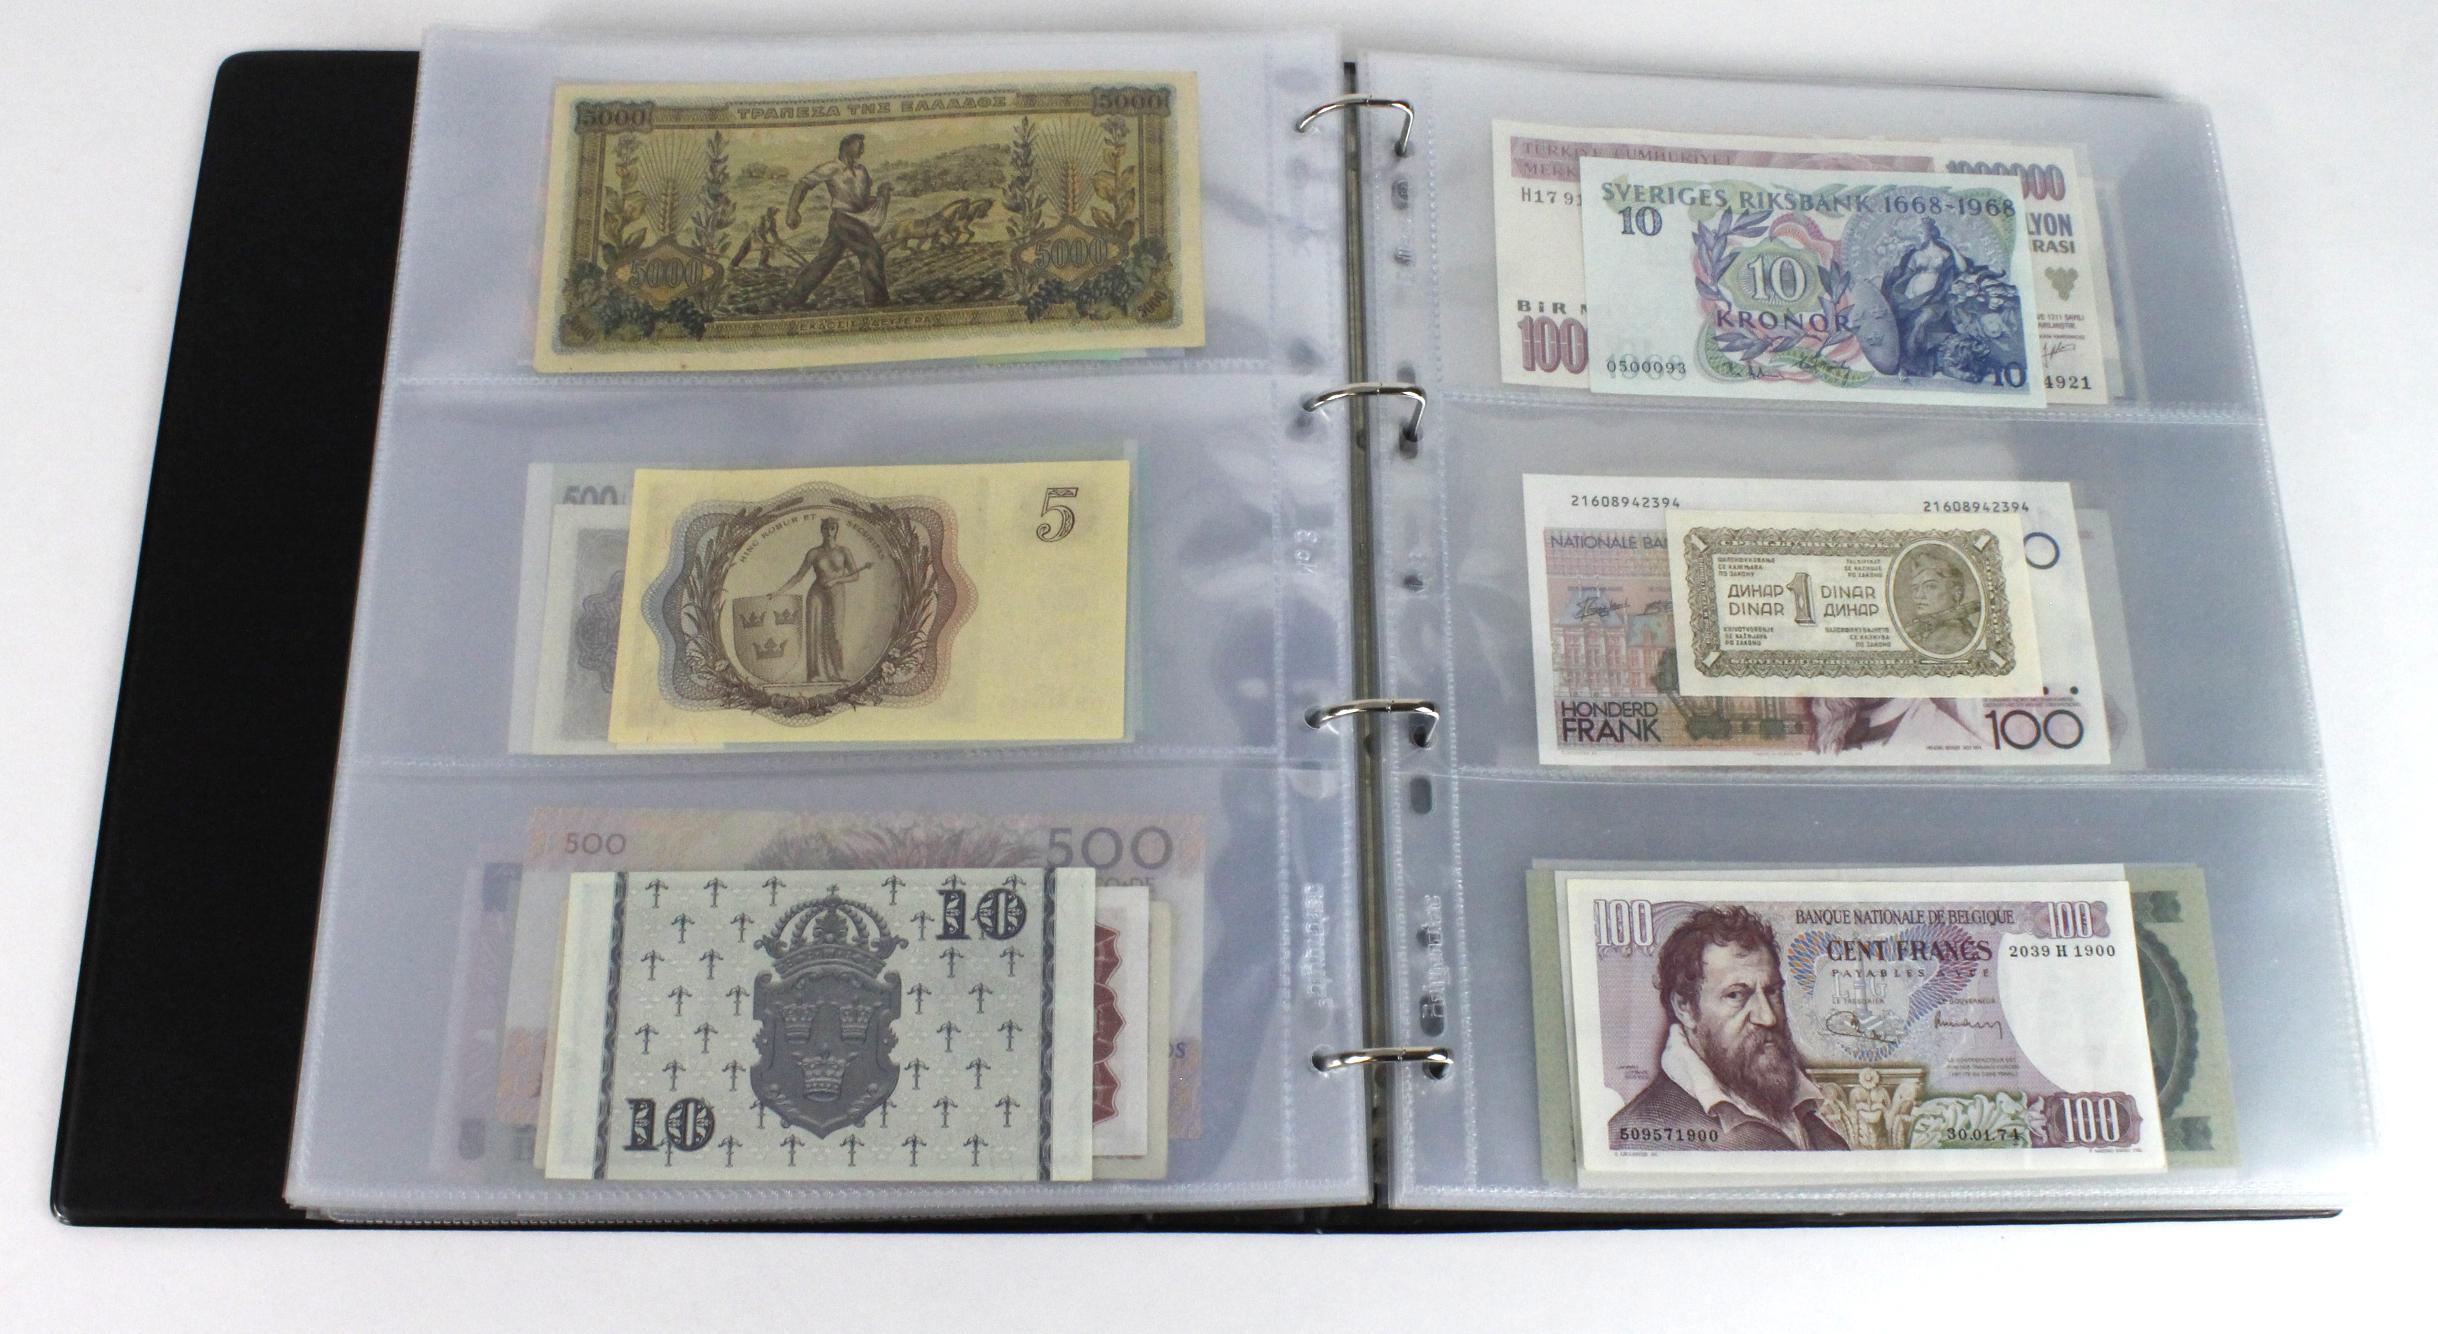 World (163), in banknote album including Bahamas, Spain, Sweden, Netherlands, Algeria, Macau, - Image 39 of 57